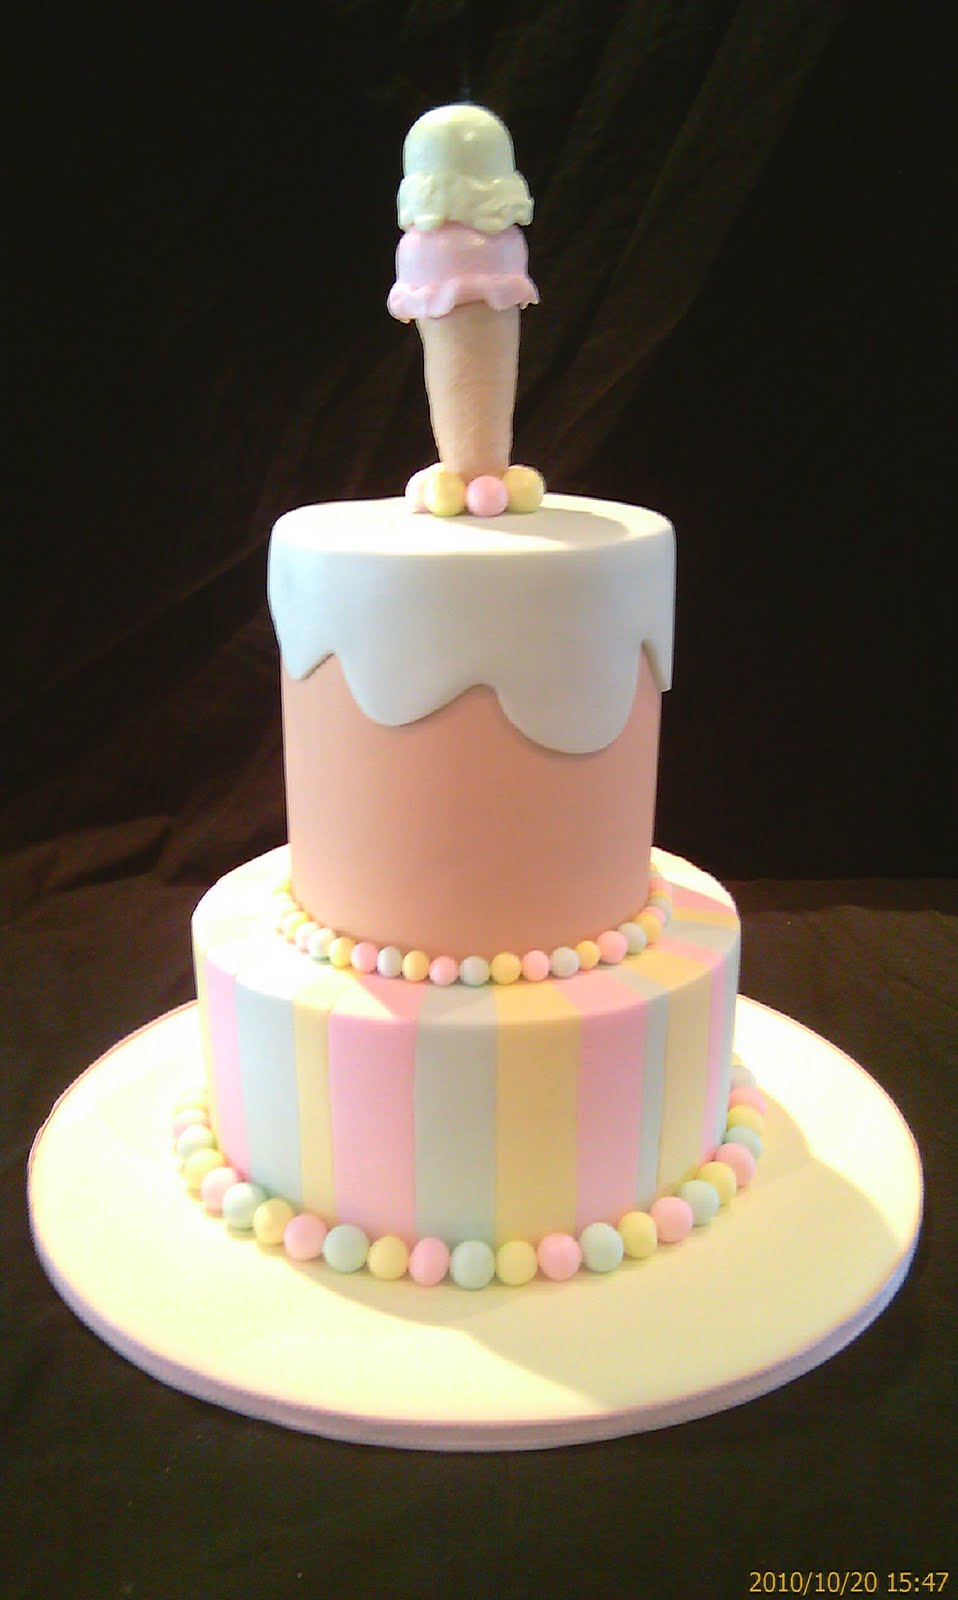 The Cupcake Fairy Big Cakes 3 Classes